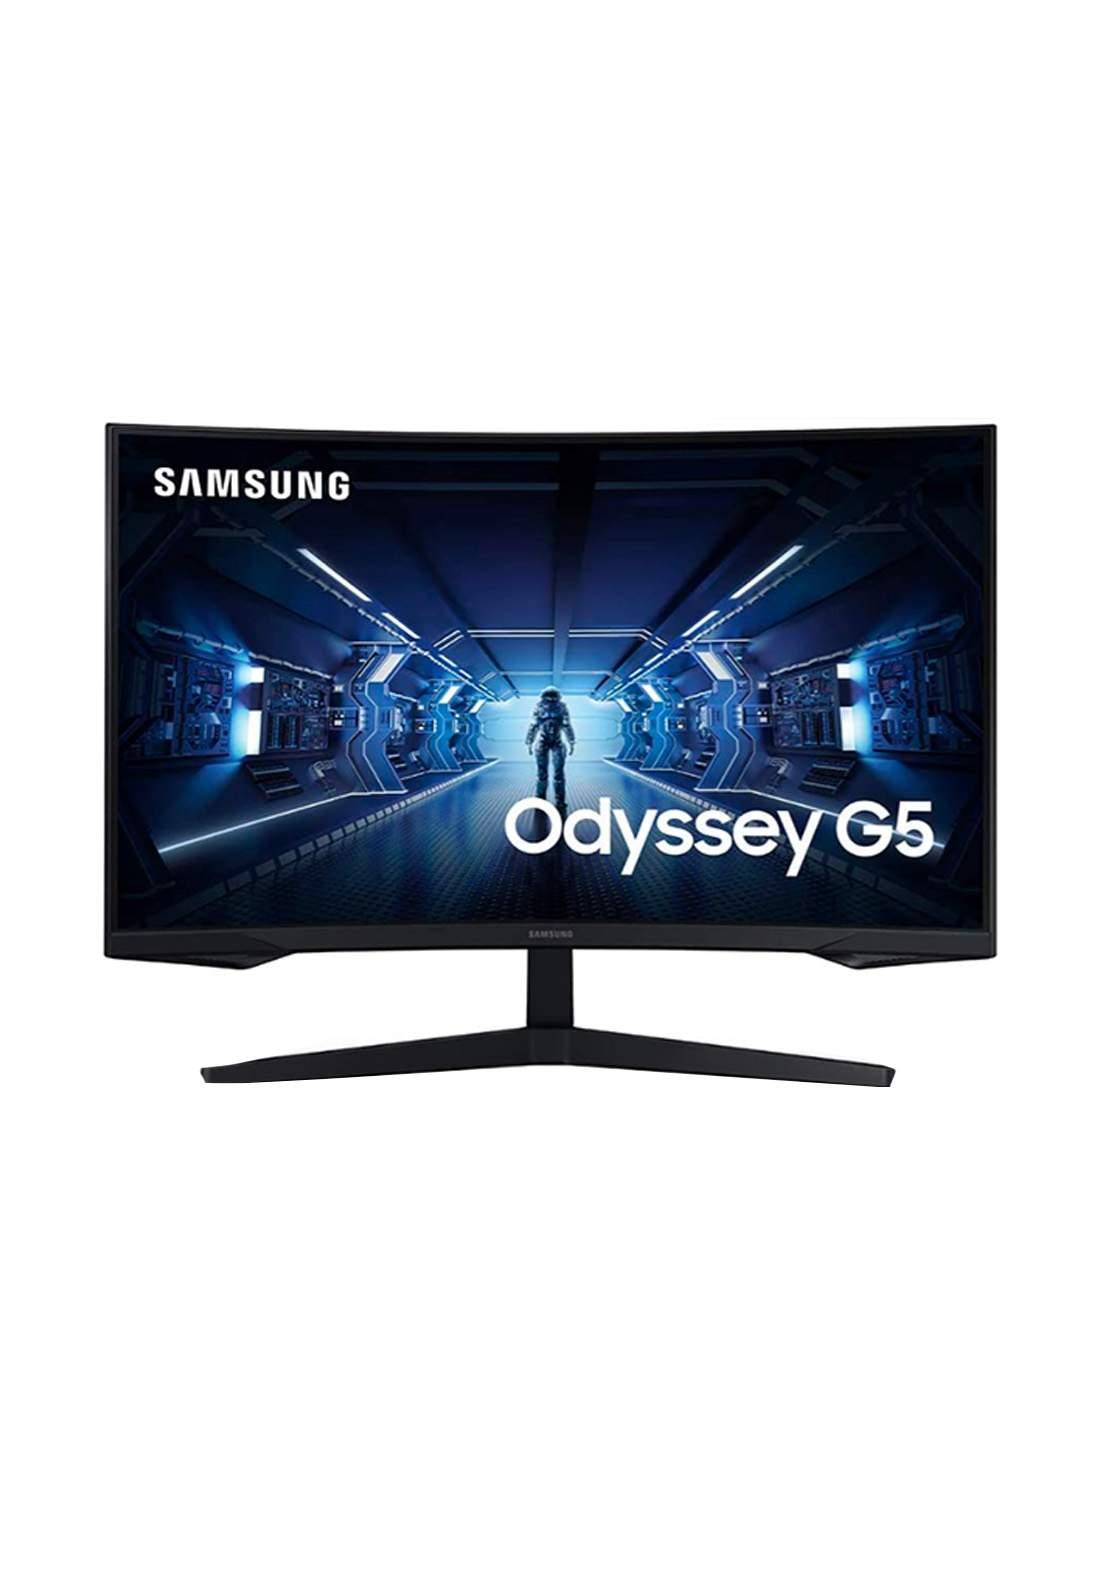 Samsung Odyssey G5 Gaming Monitor 32 - Black